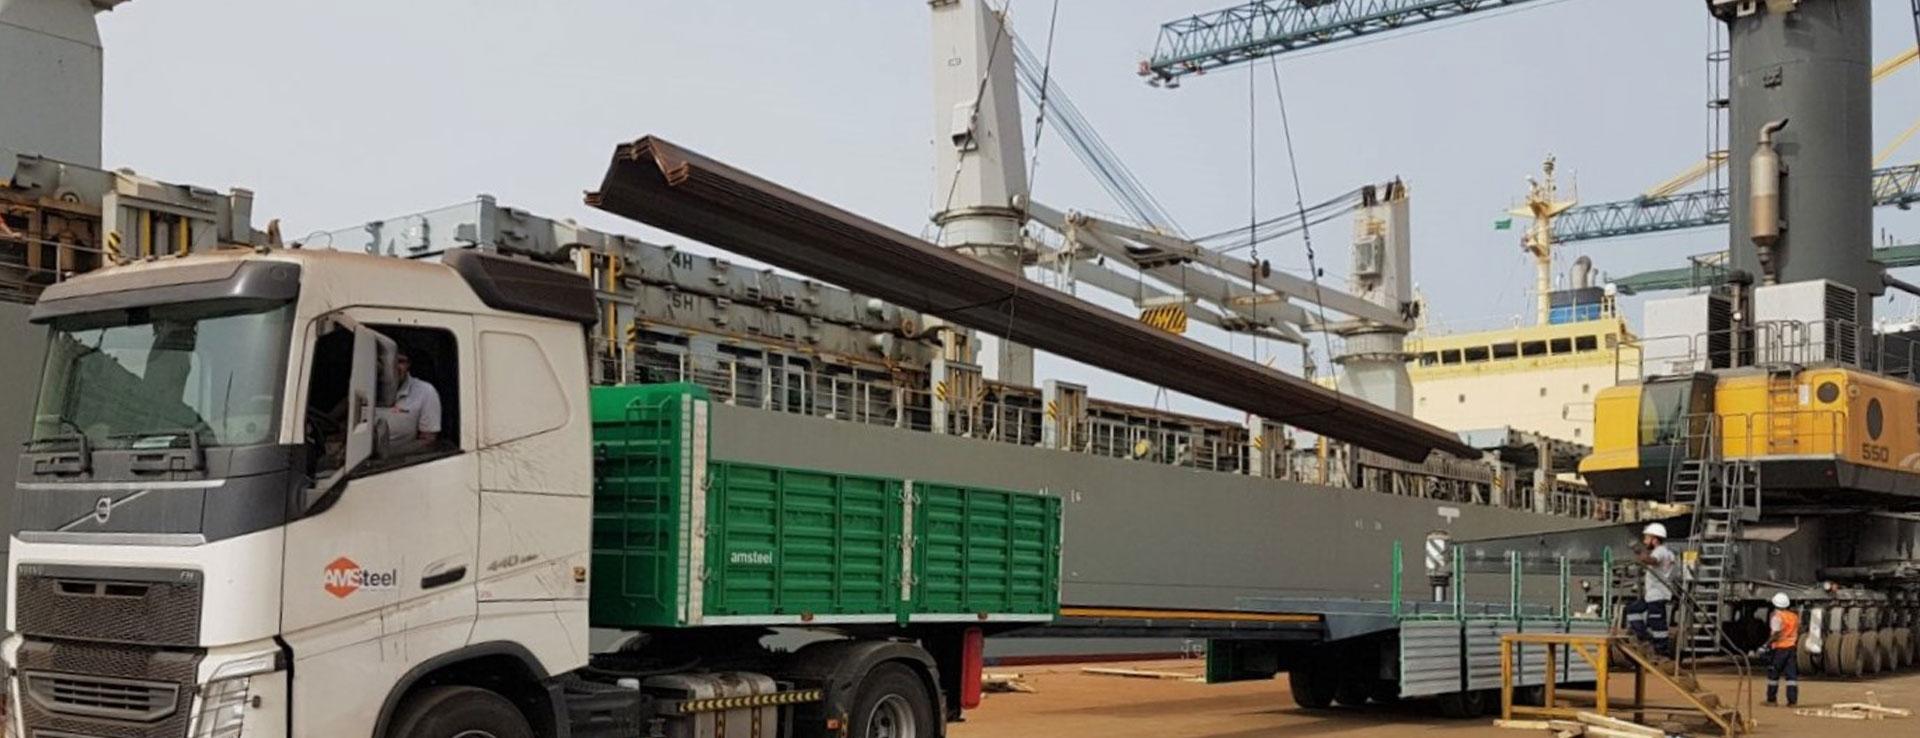 Oversize Cargo Transportation | Amsteel - We Can Handle